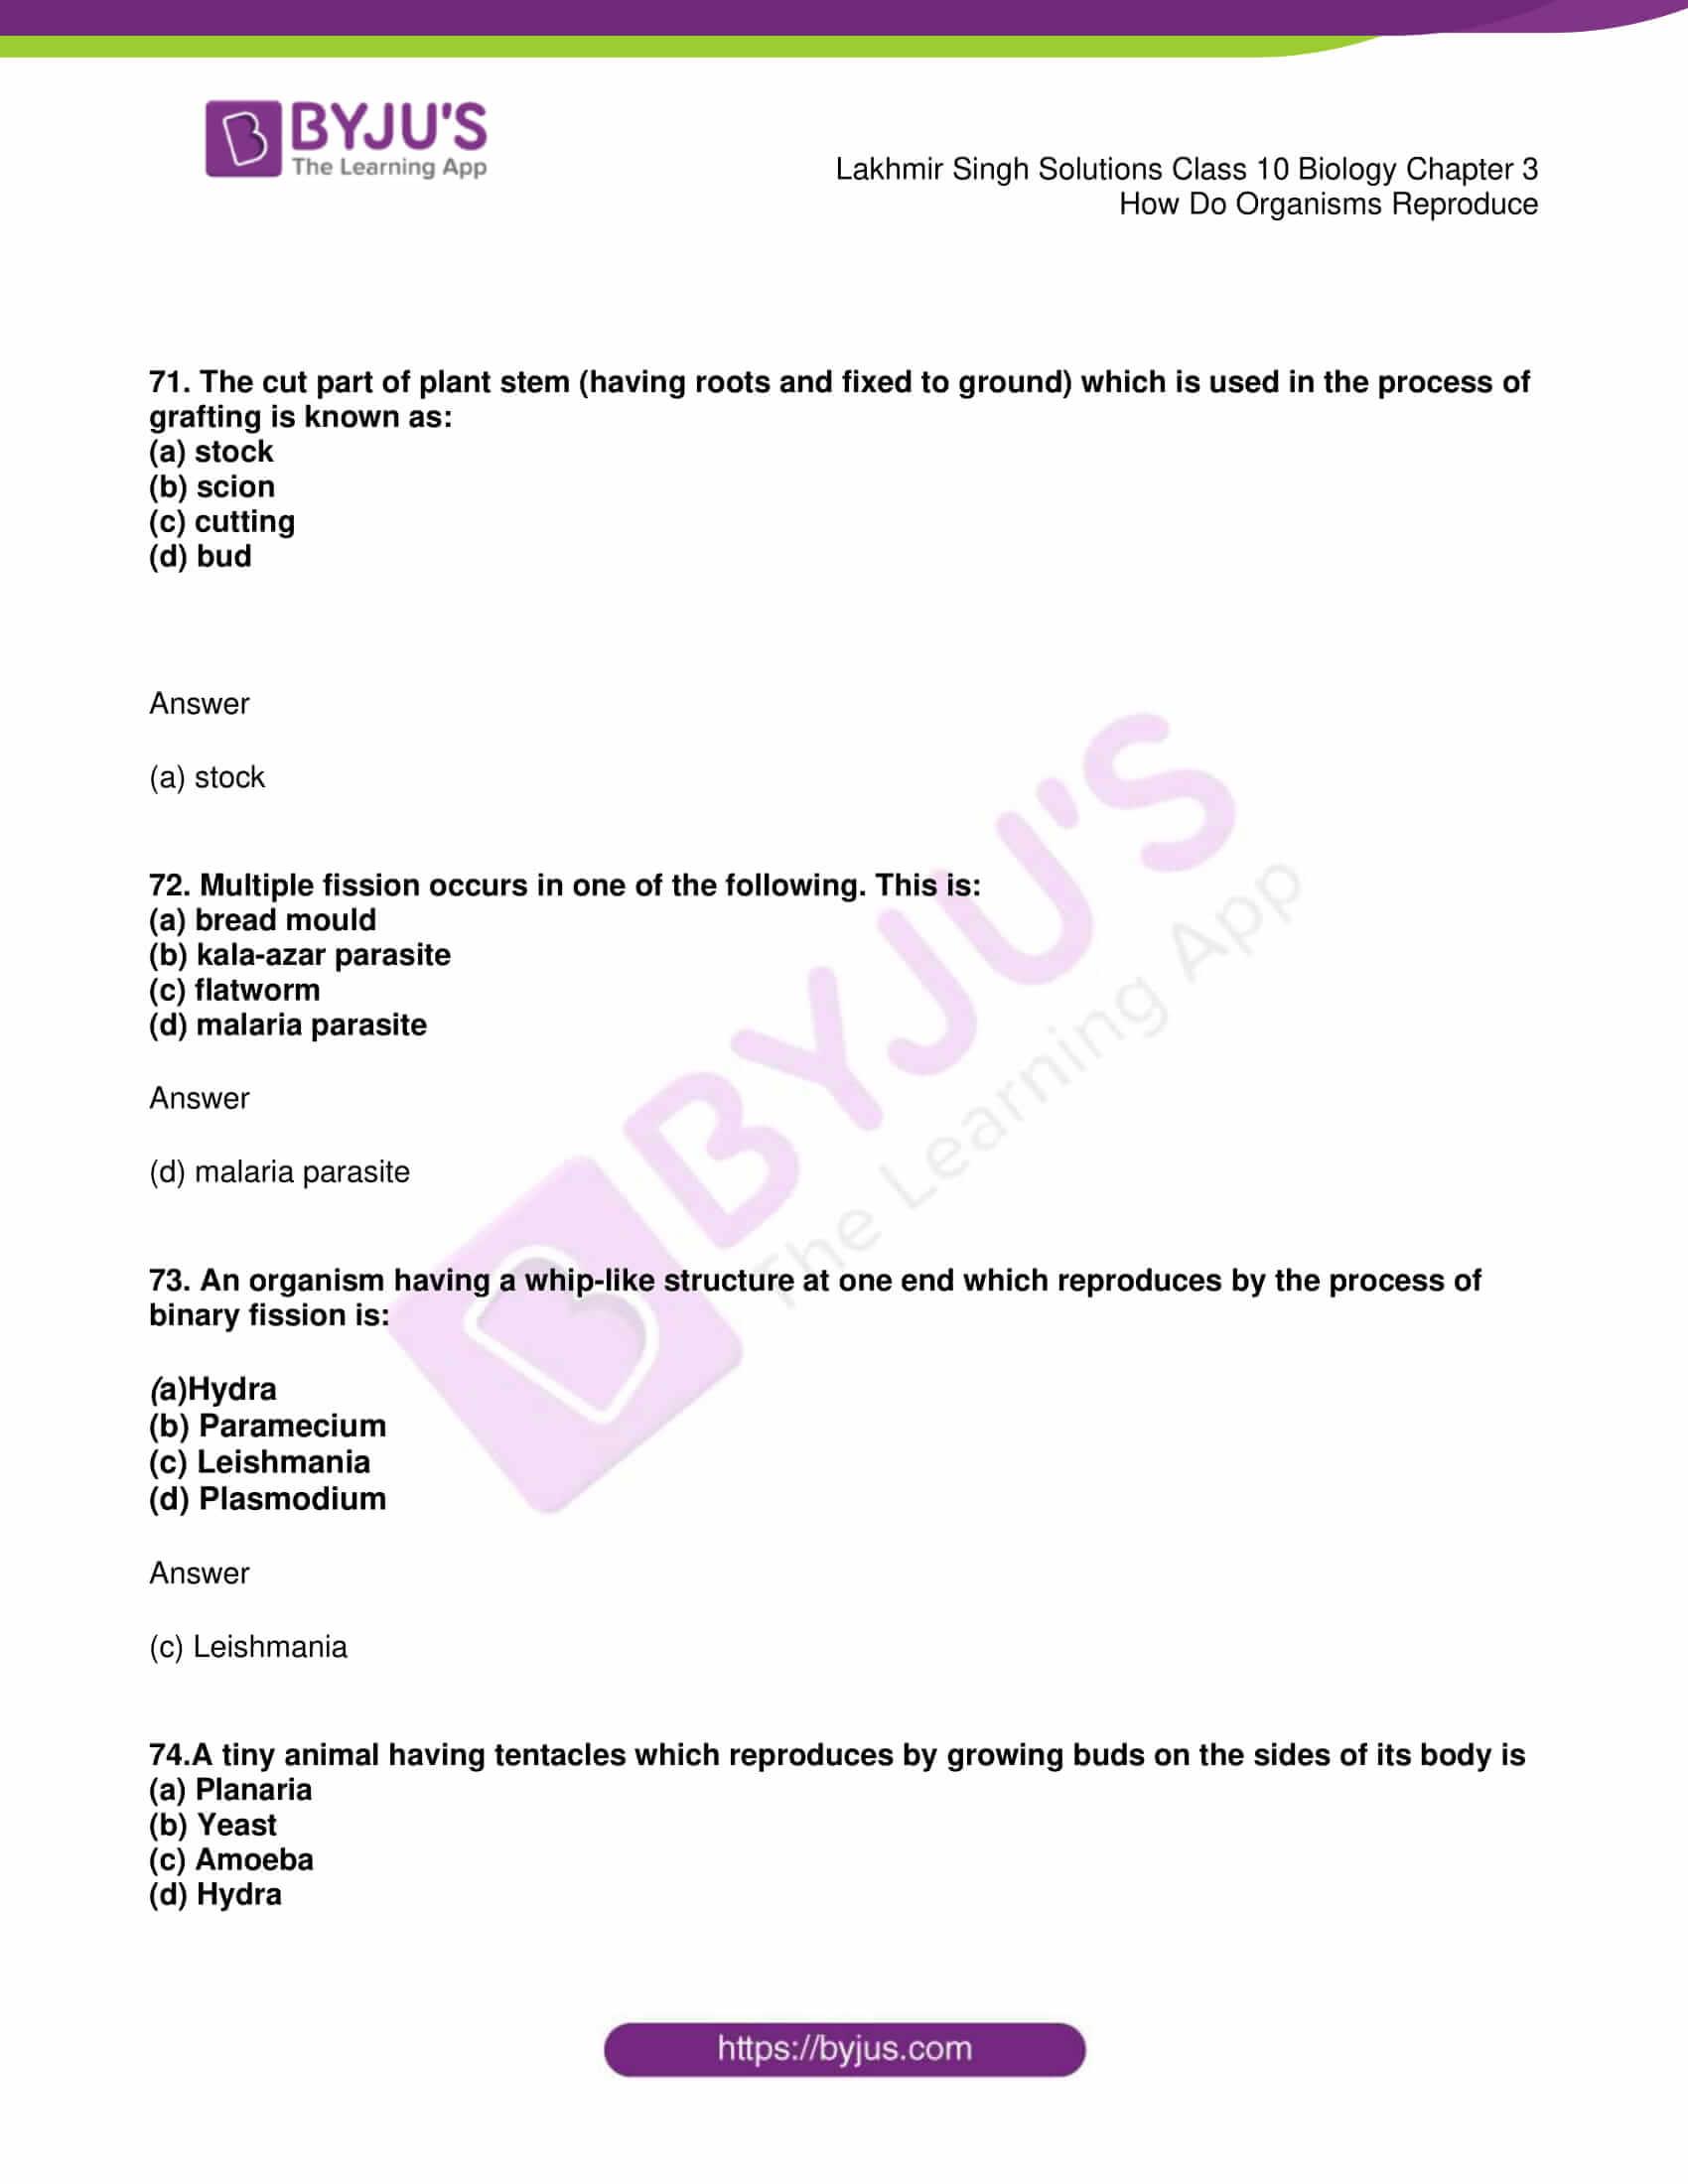 lakhmir singh solutions class 10 biology chapter 3 25